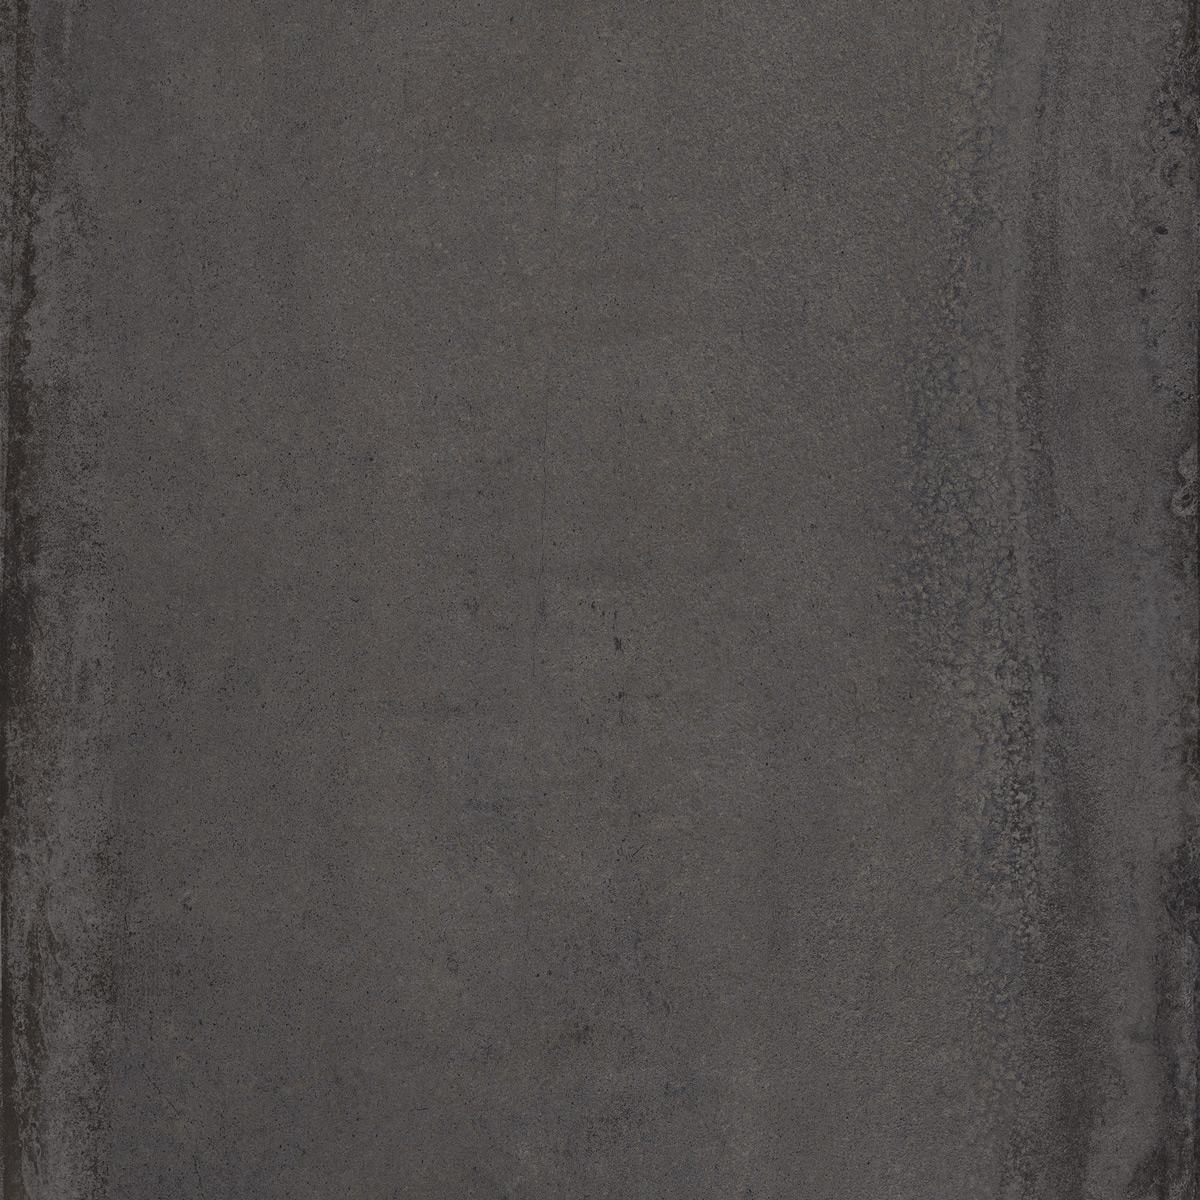 Castelvetro Materika Terrassenplatte Nero 100x100 MATT